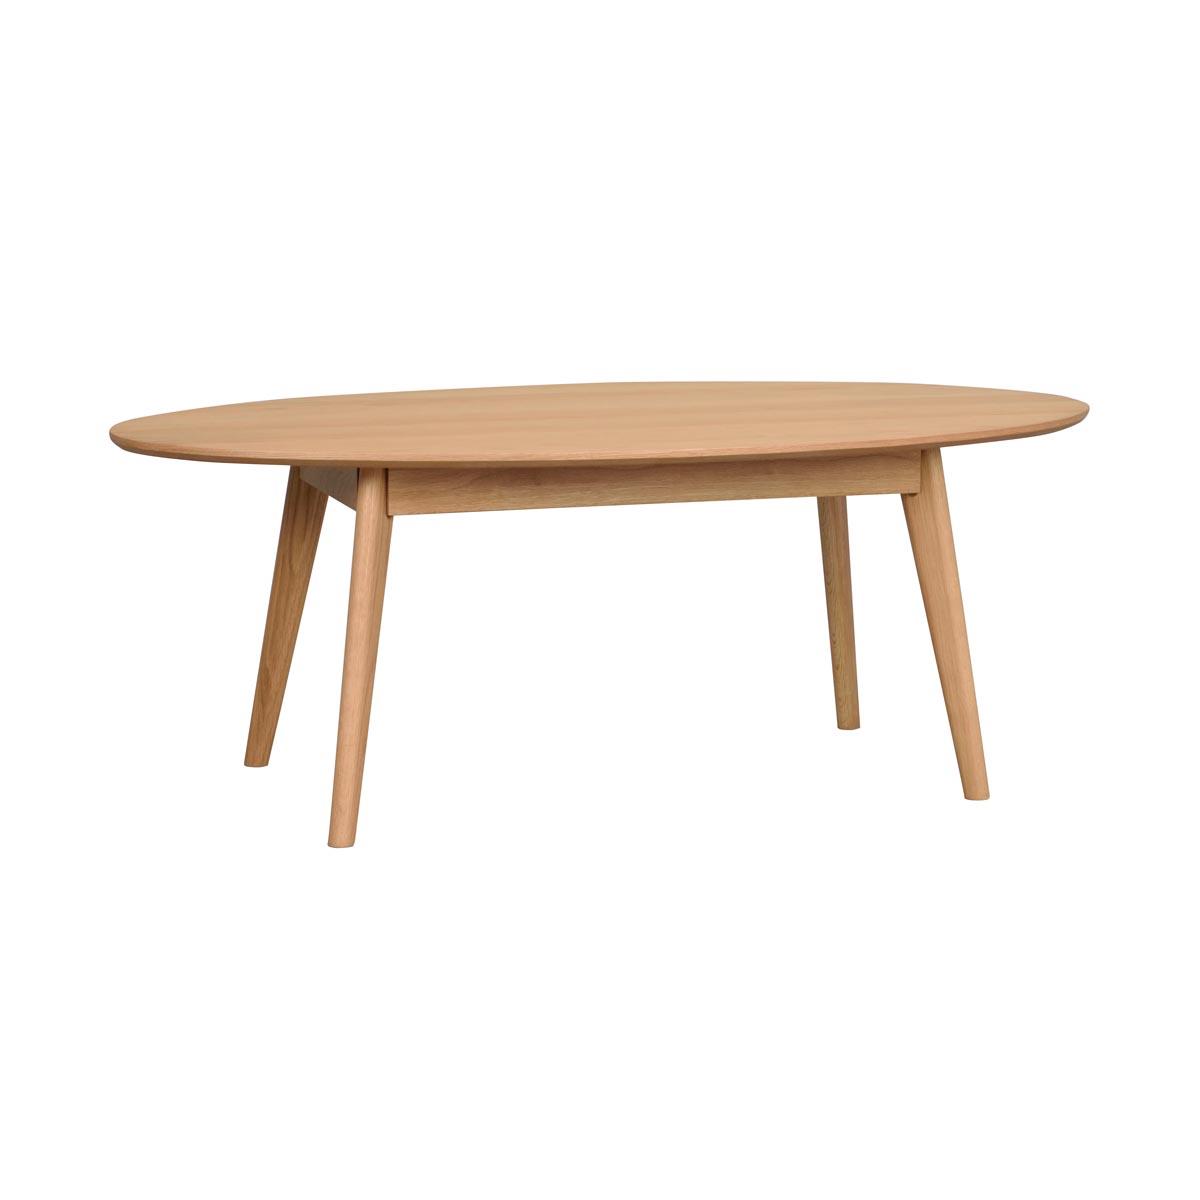 Yumi-ovalt-soffbord-ek-119206